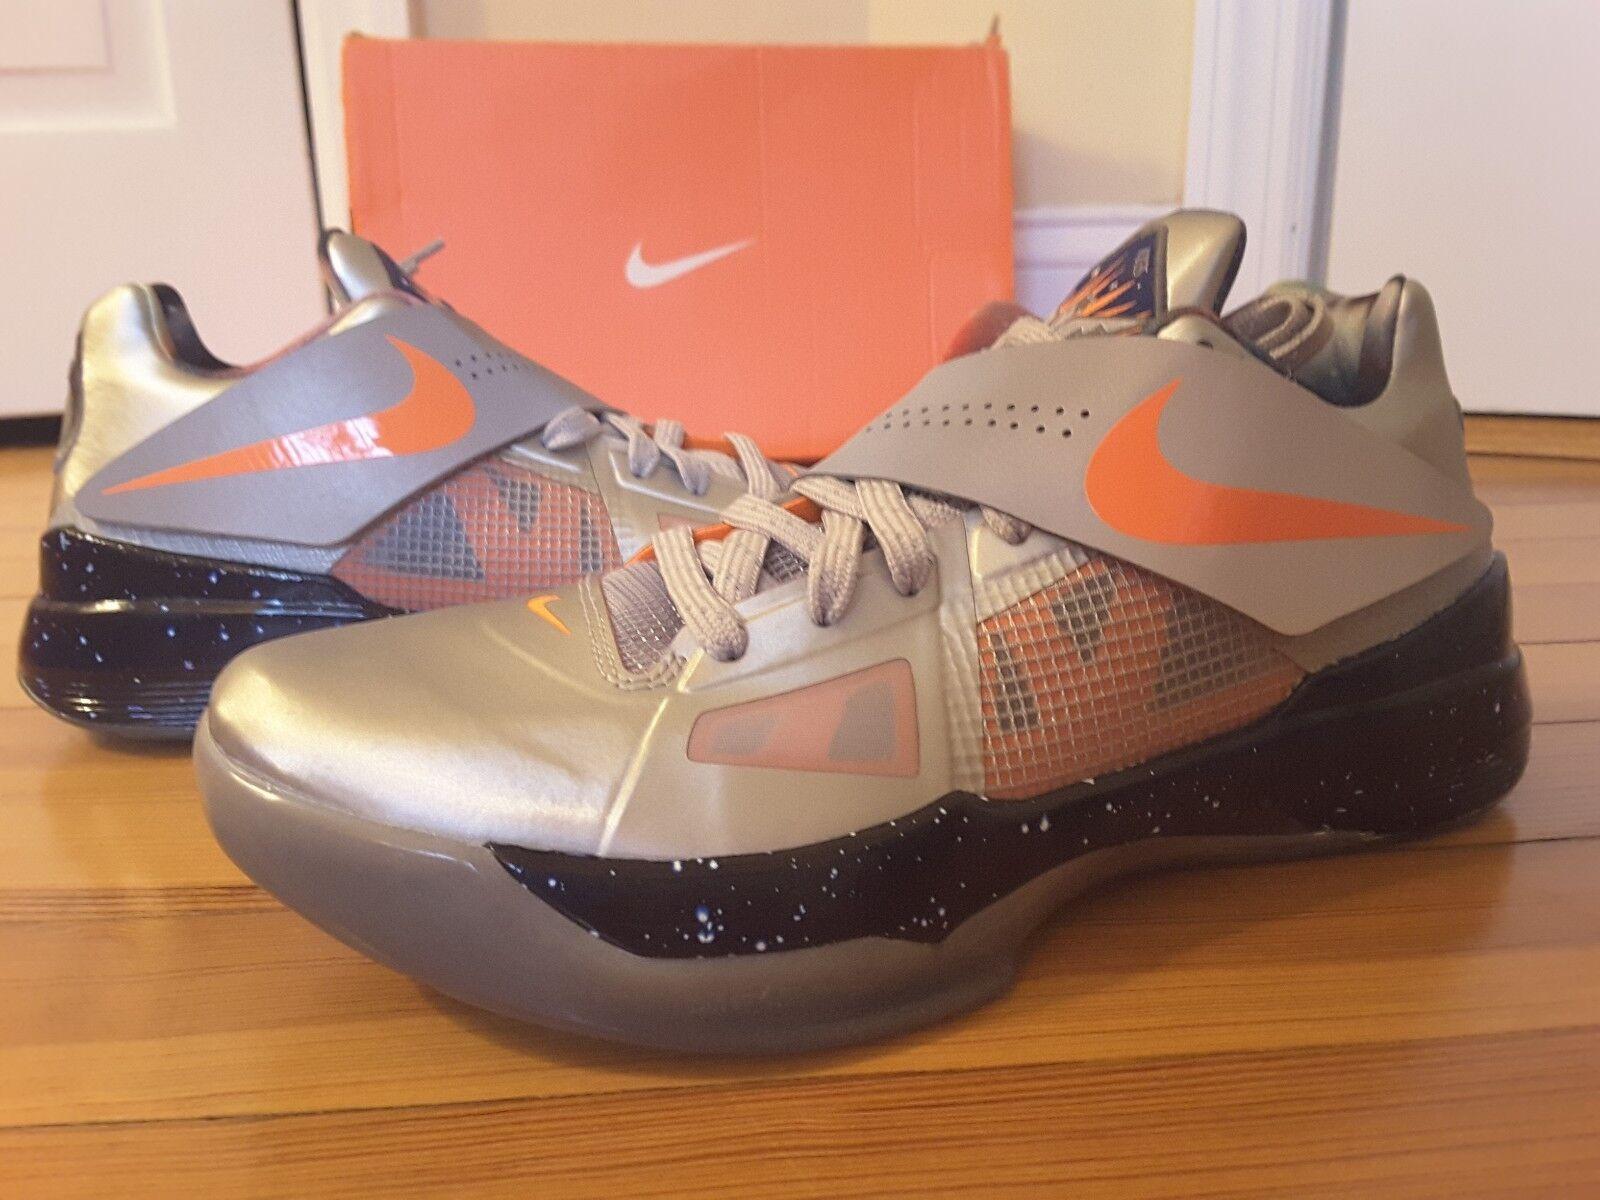 New Nike KD IV 4 Galaxy All Star 520814 001 Silver orange Glow In The Dark AS